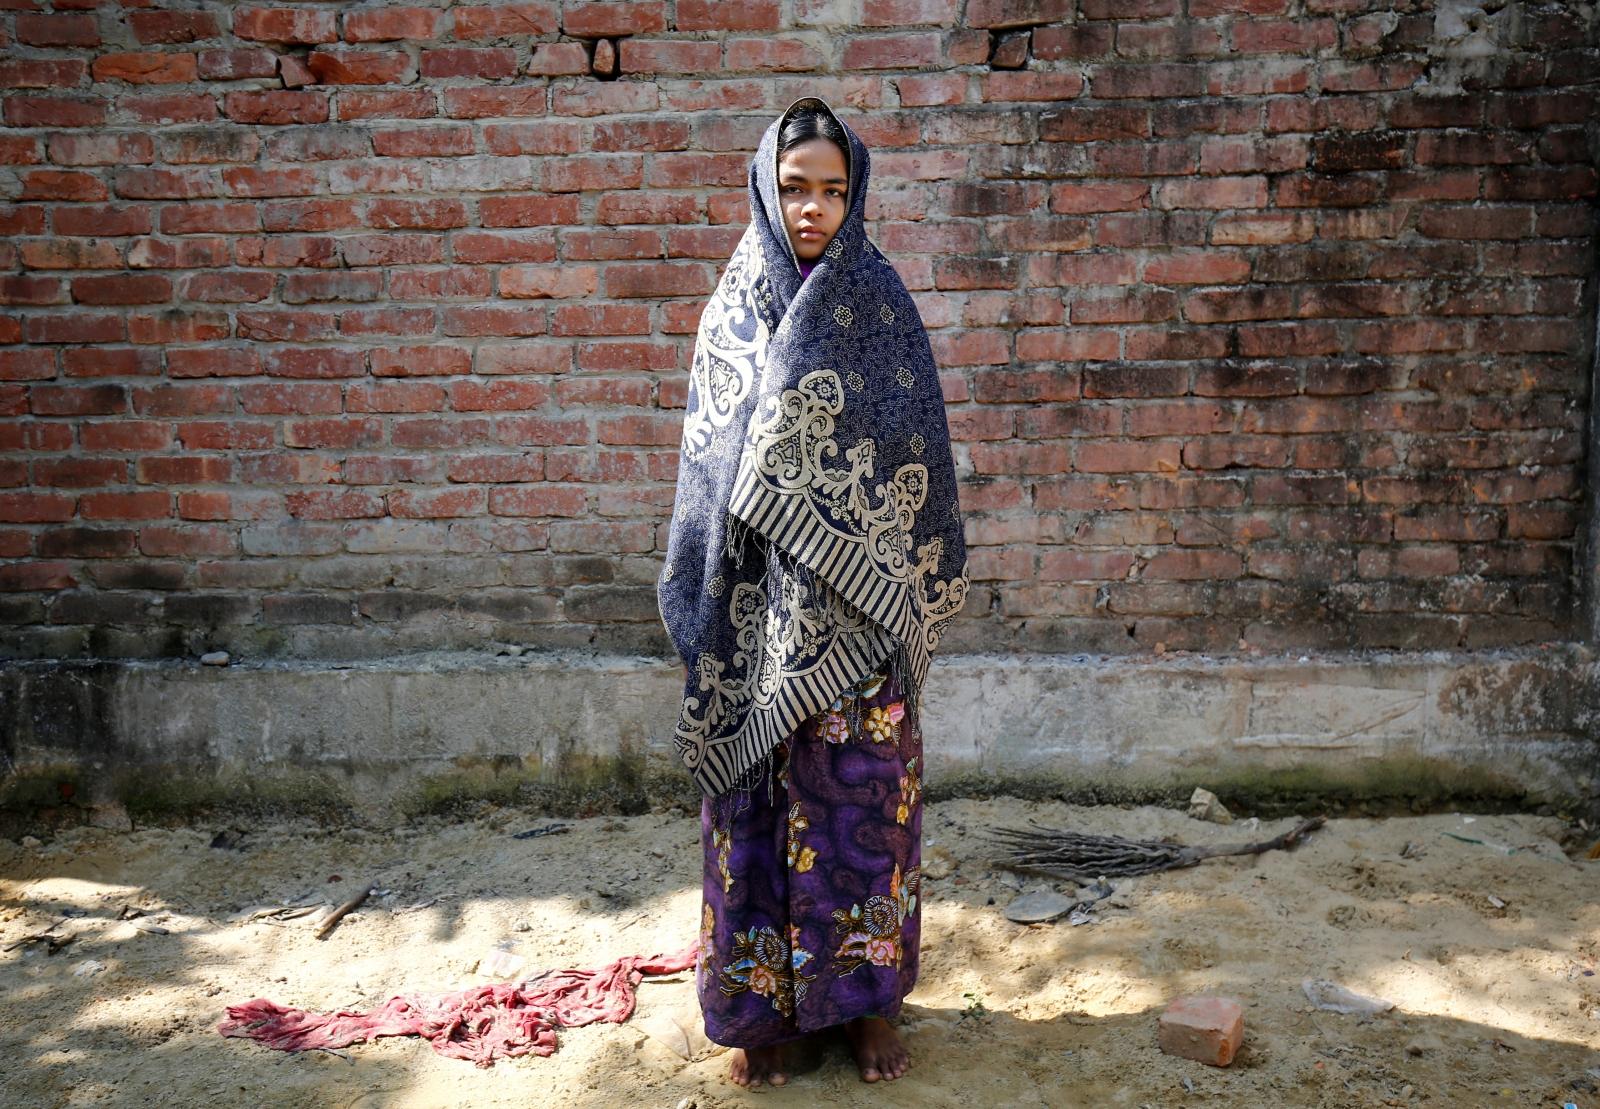 India to deport Rohingyas